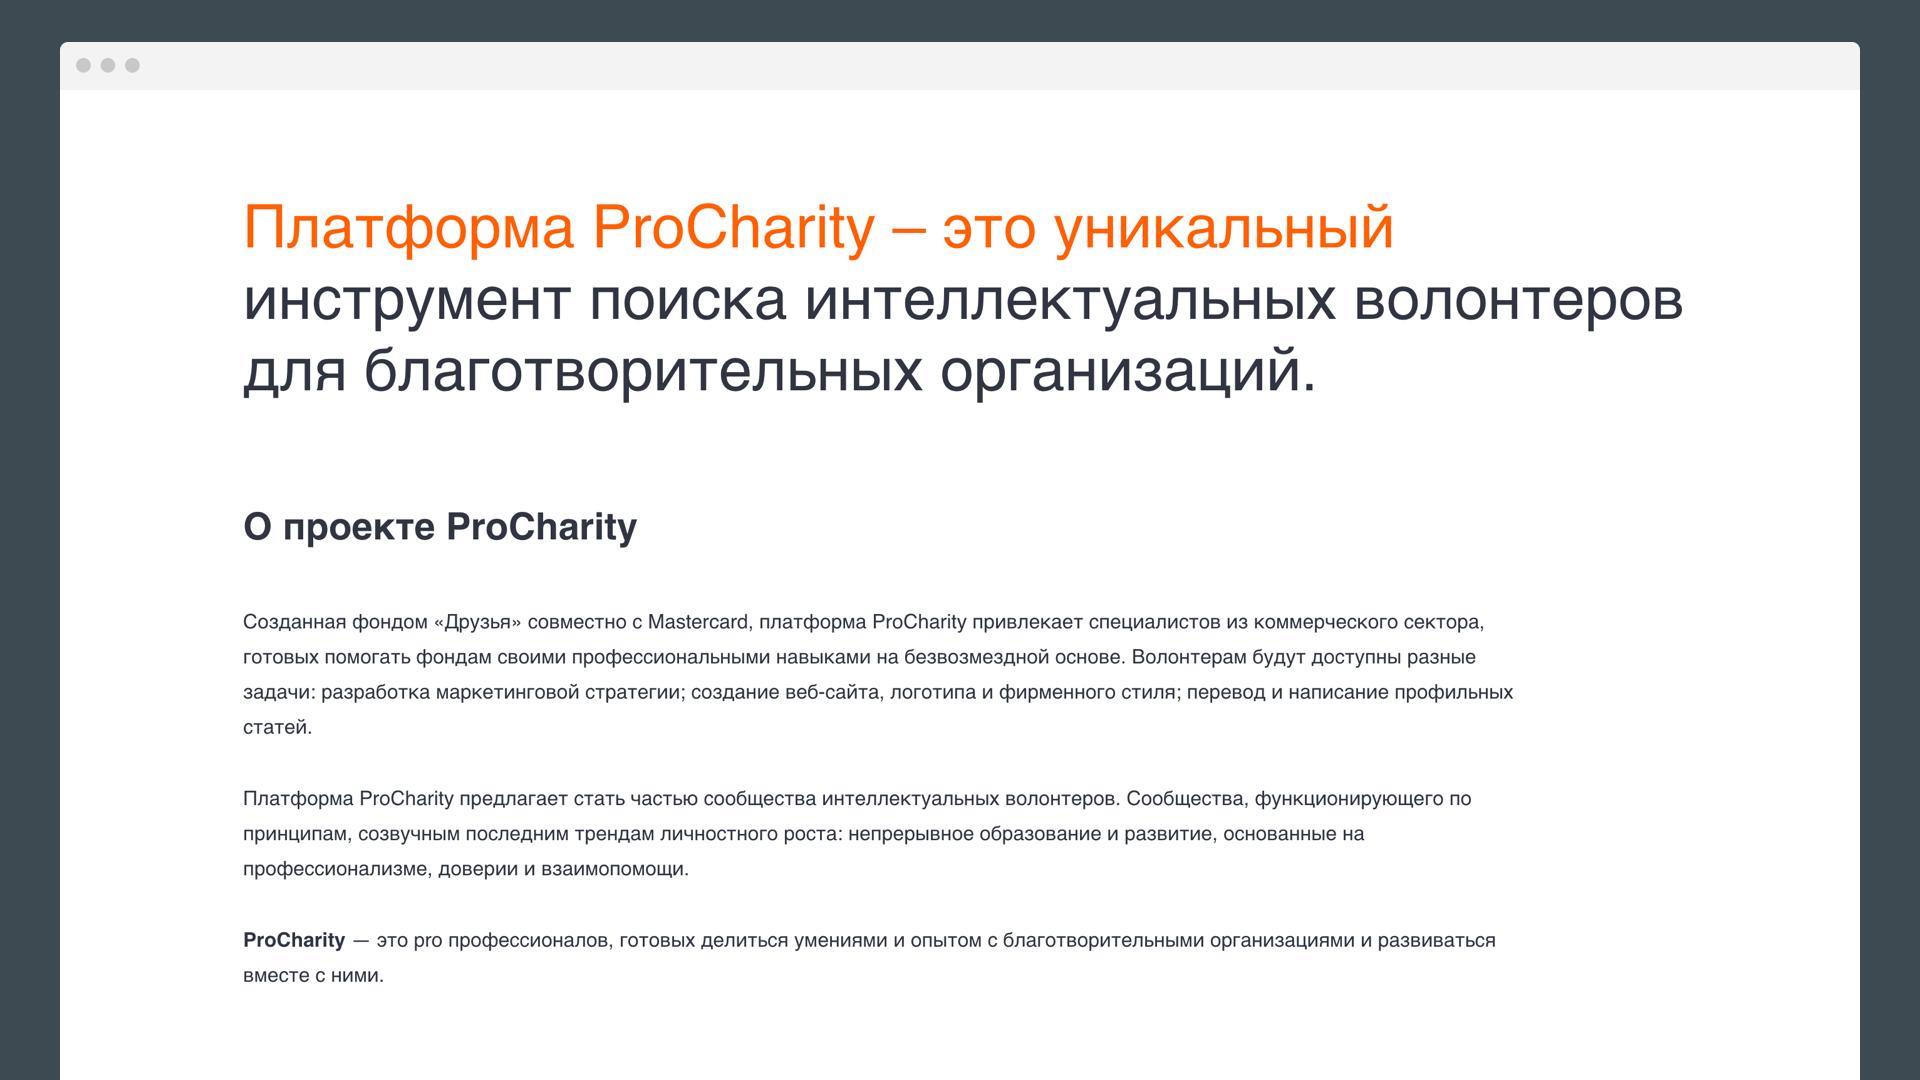 Разработка портала ProCharity